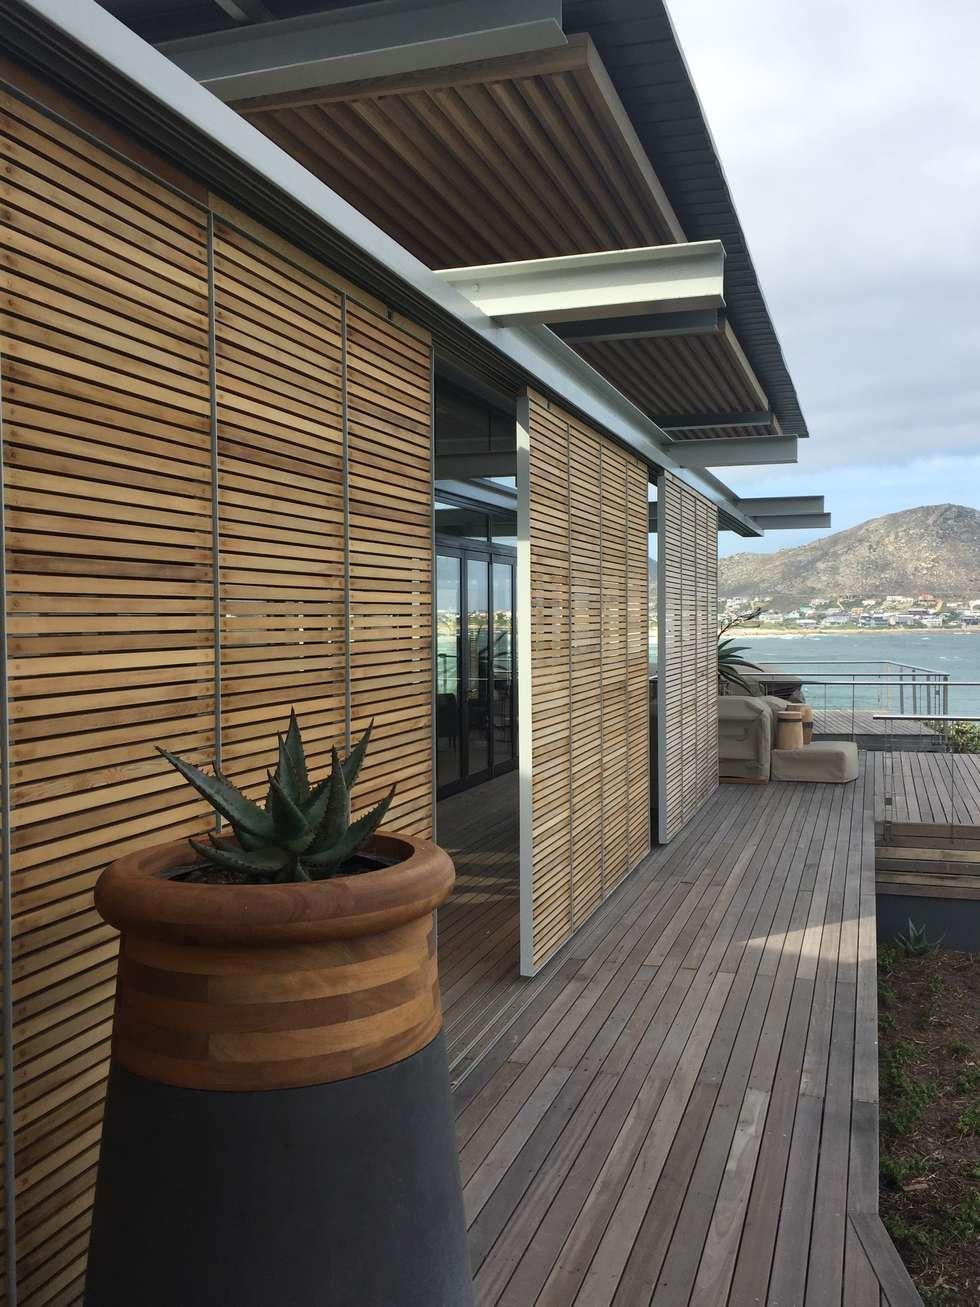 Timber Deck & Screens:  Single family home by Van der Merwe Miszewski Architects